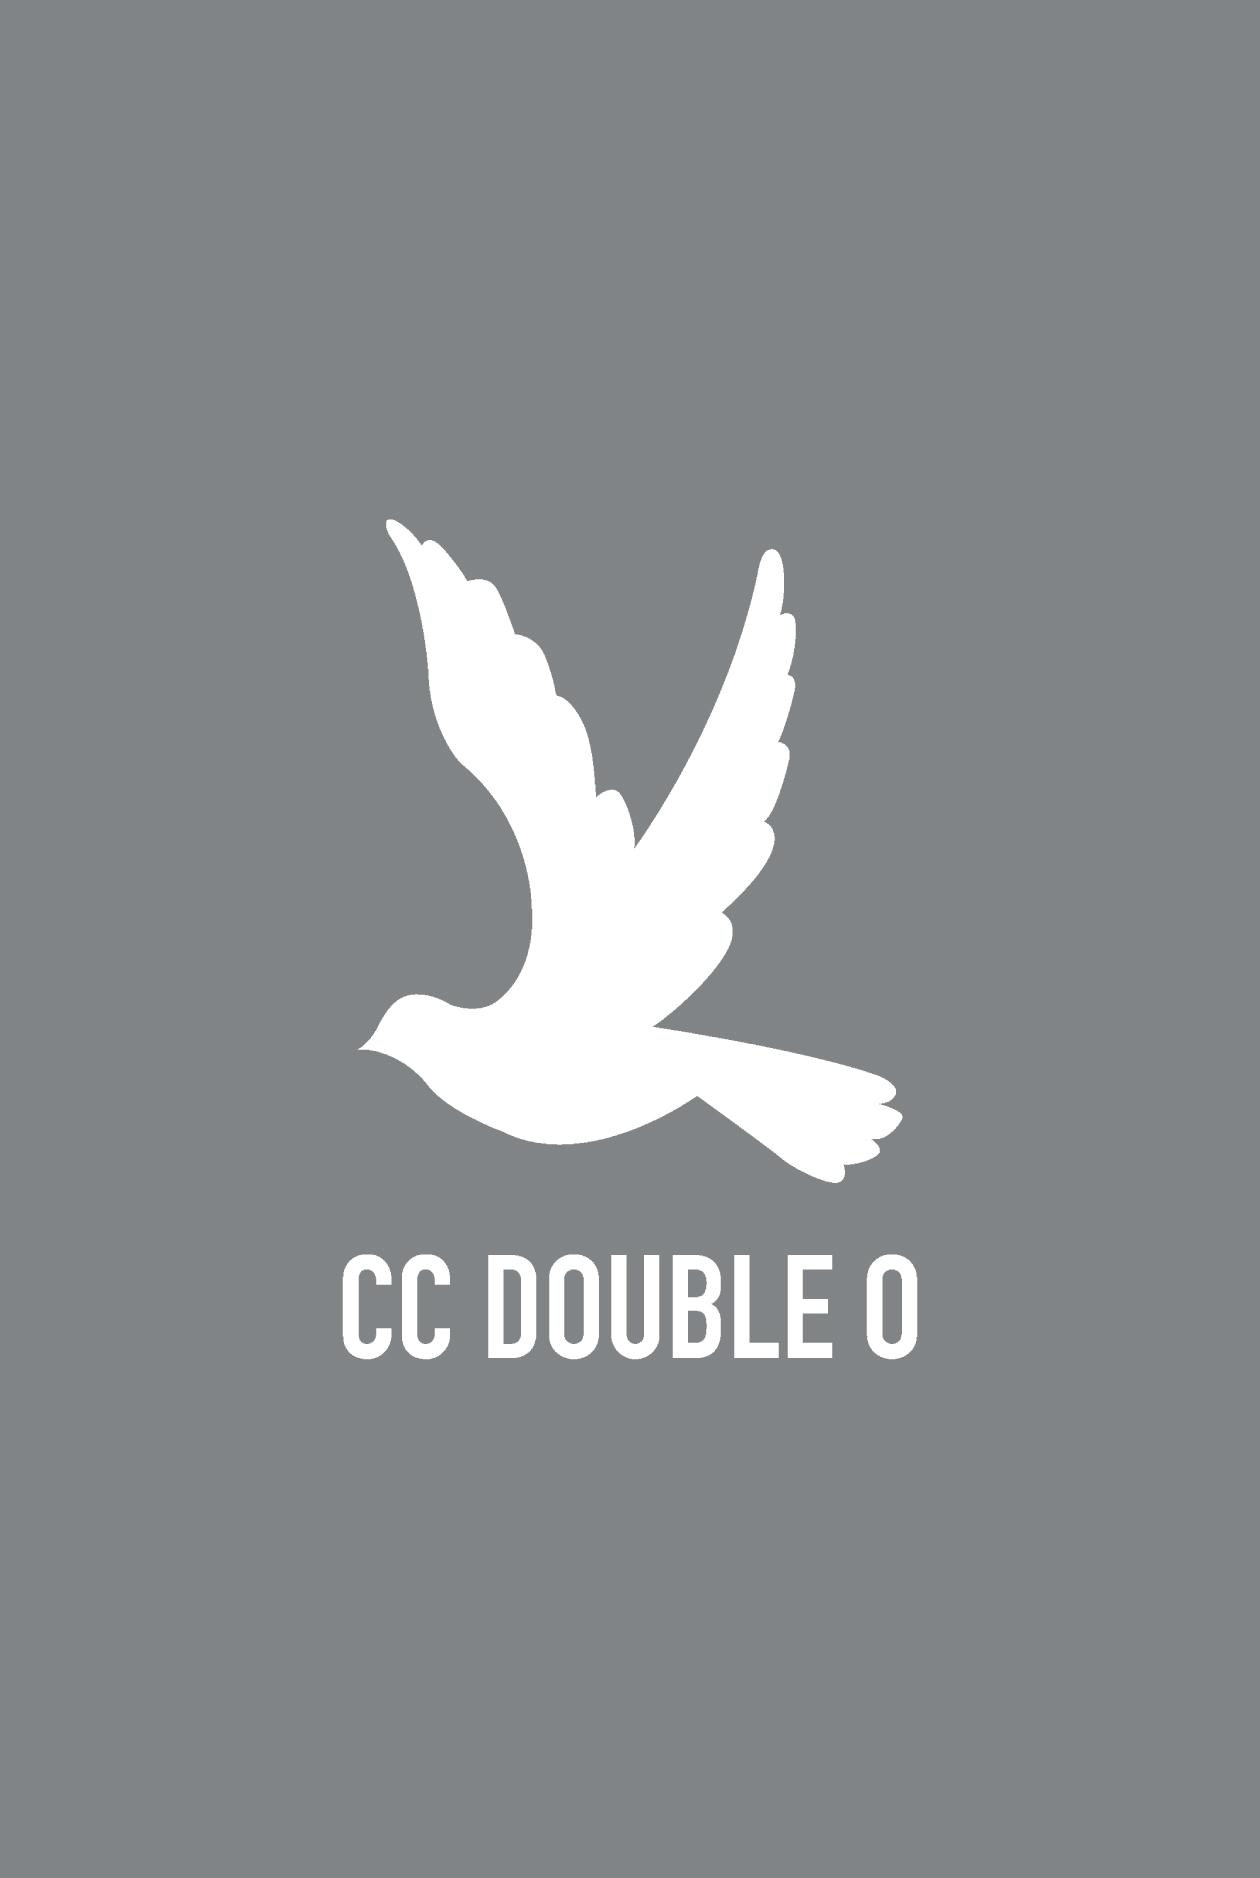 Bird Logo Polo with CC DOUBLE O Tape Detail